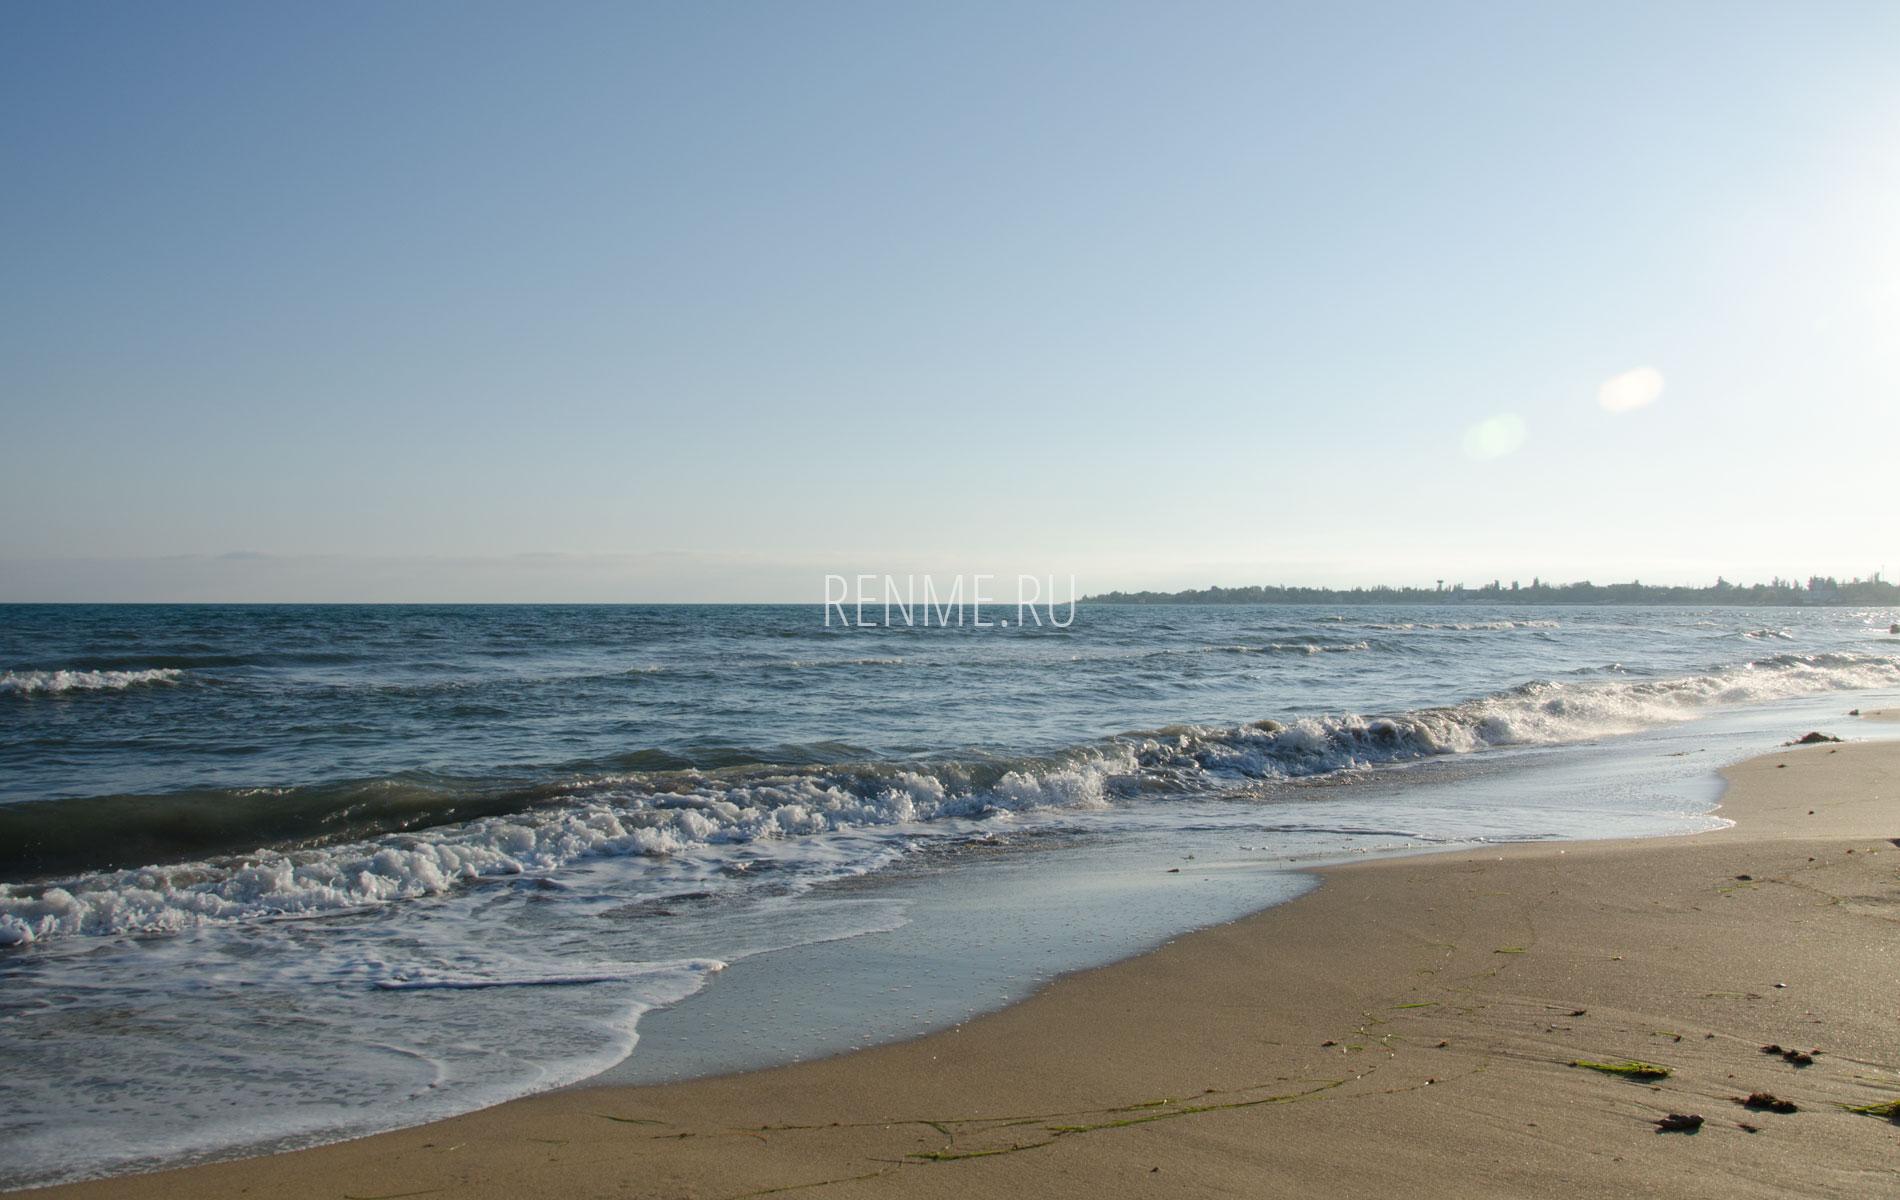 Осеннее море Евпатории в октябре 2019. Фото Евпатории